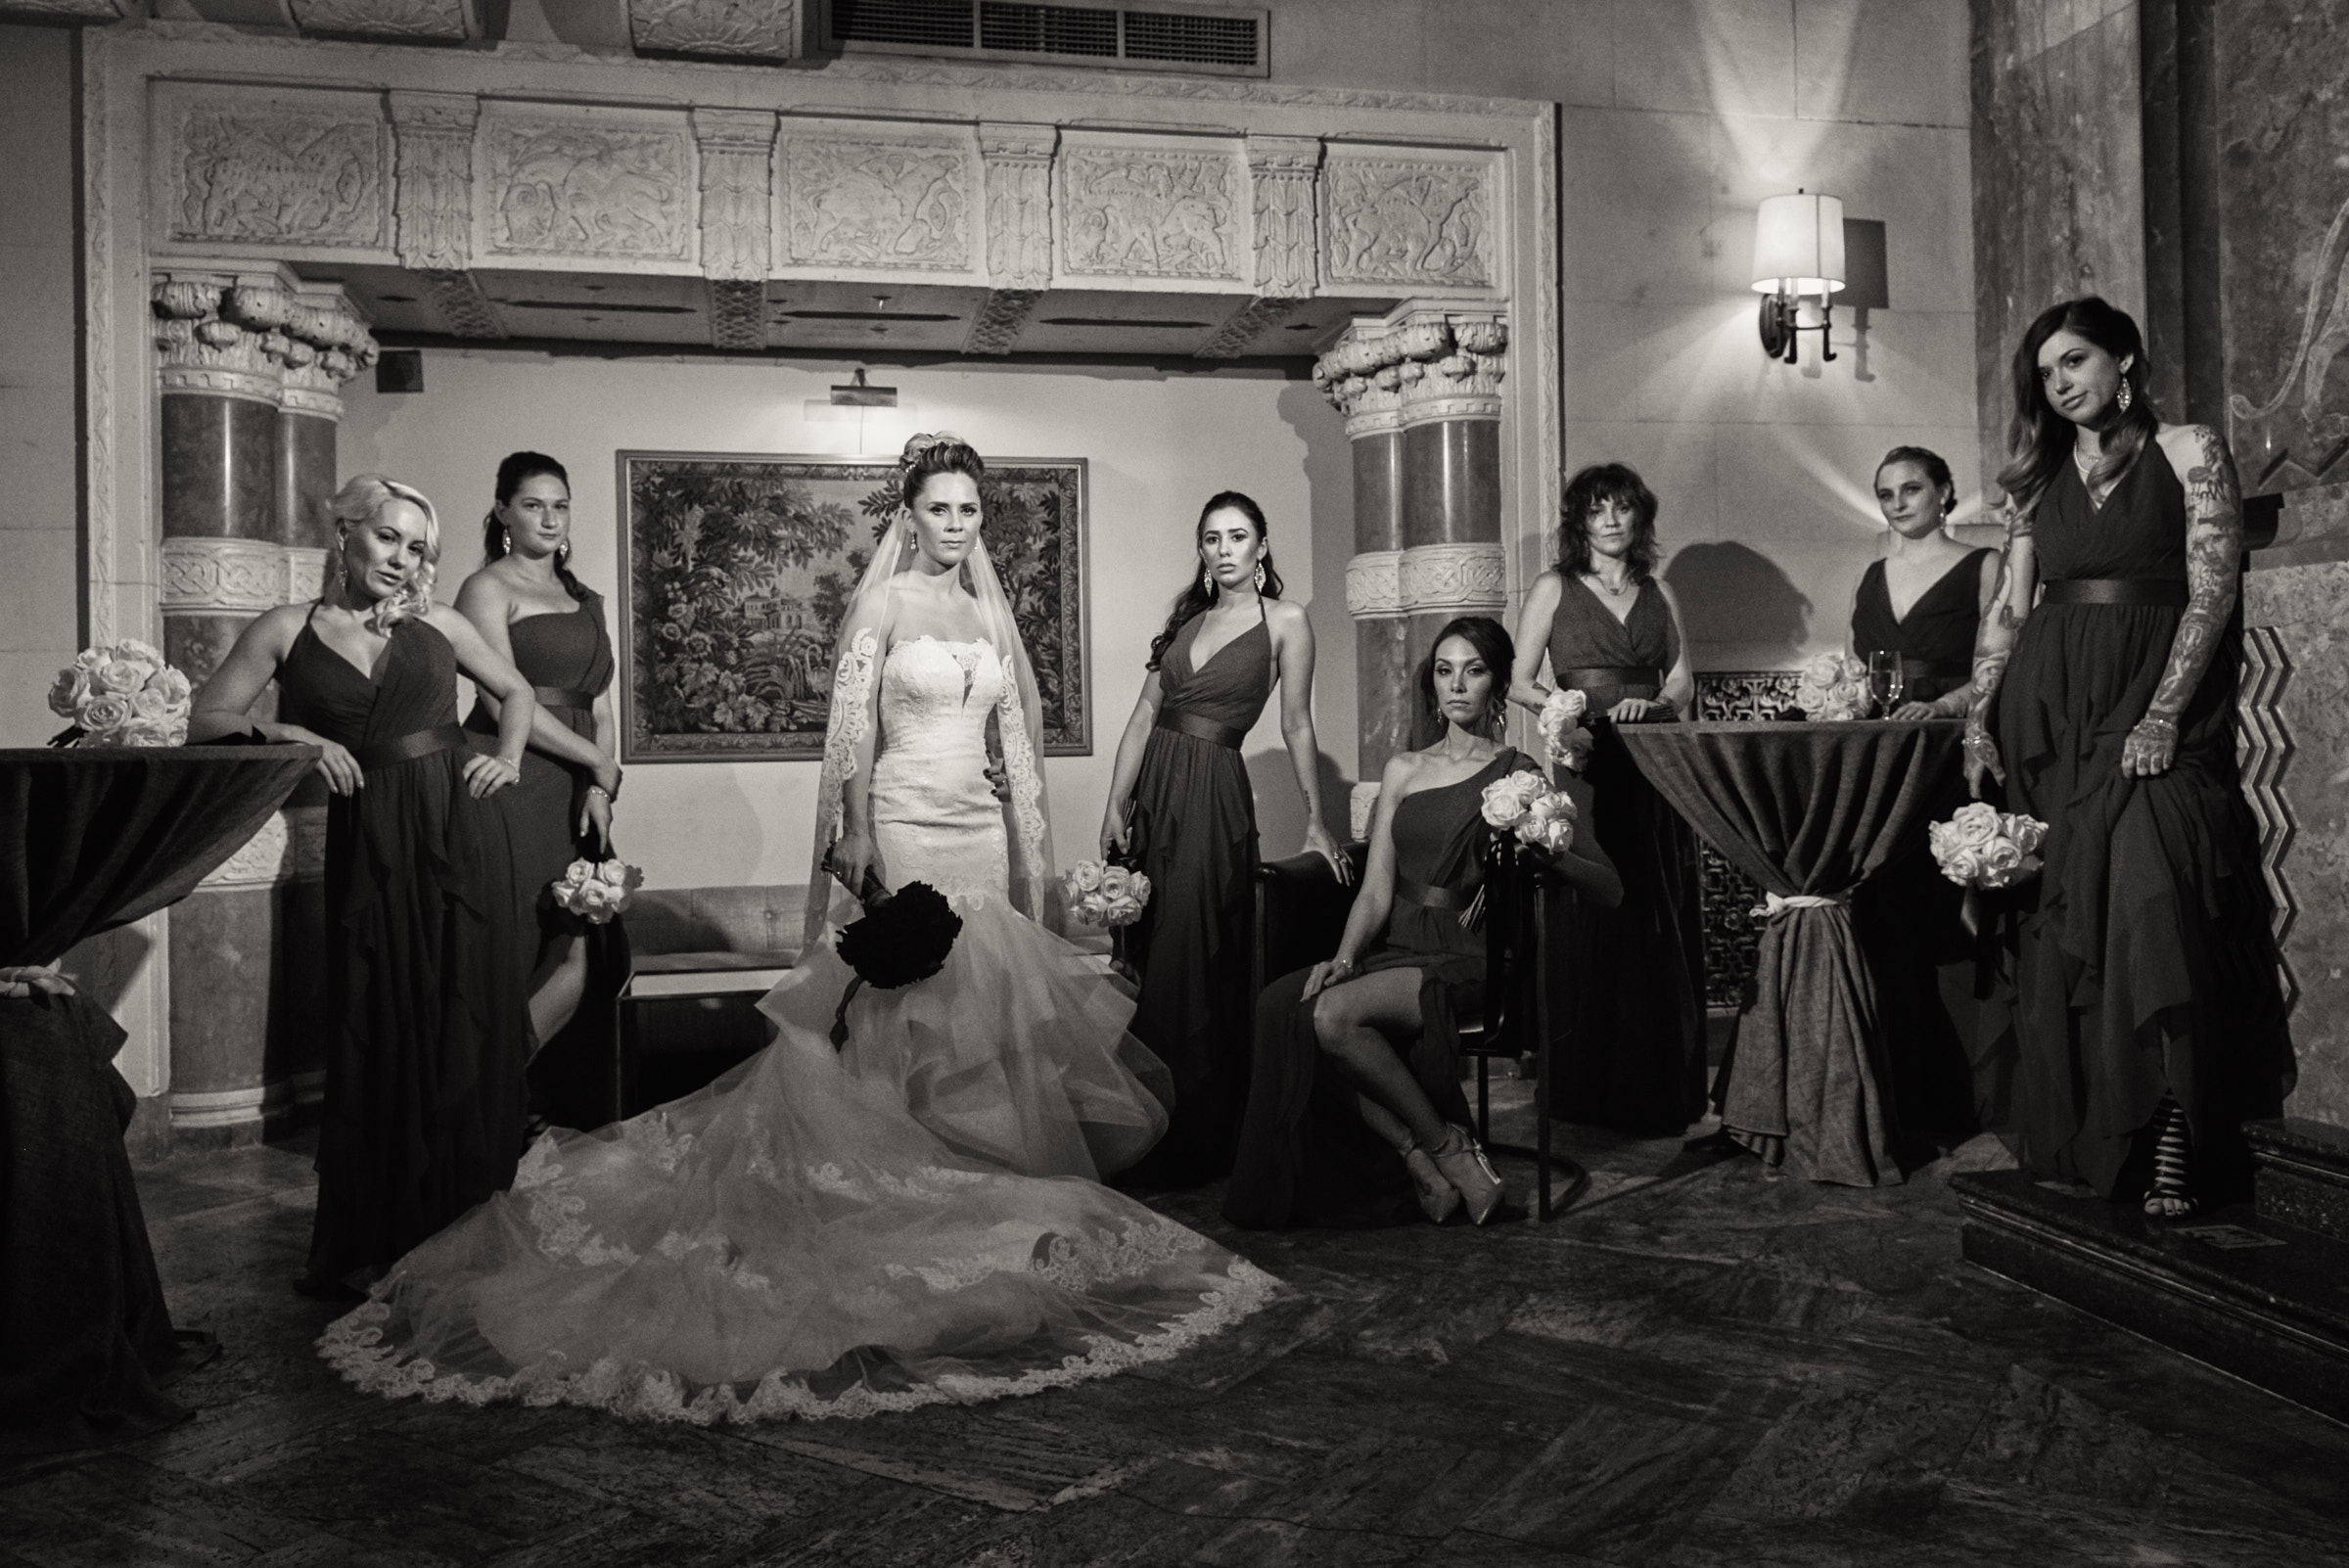 Dramatic bridesmaids portrait